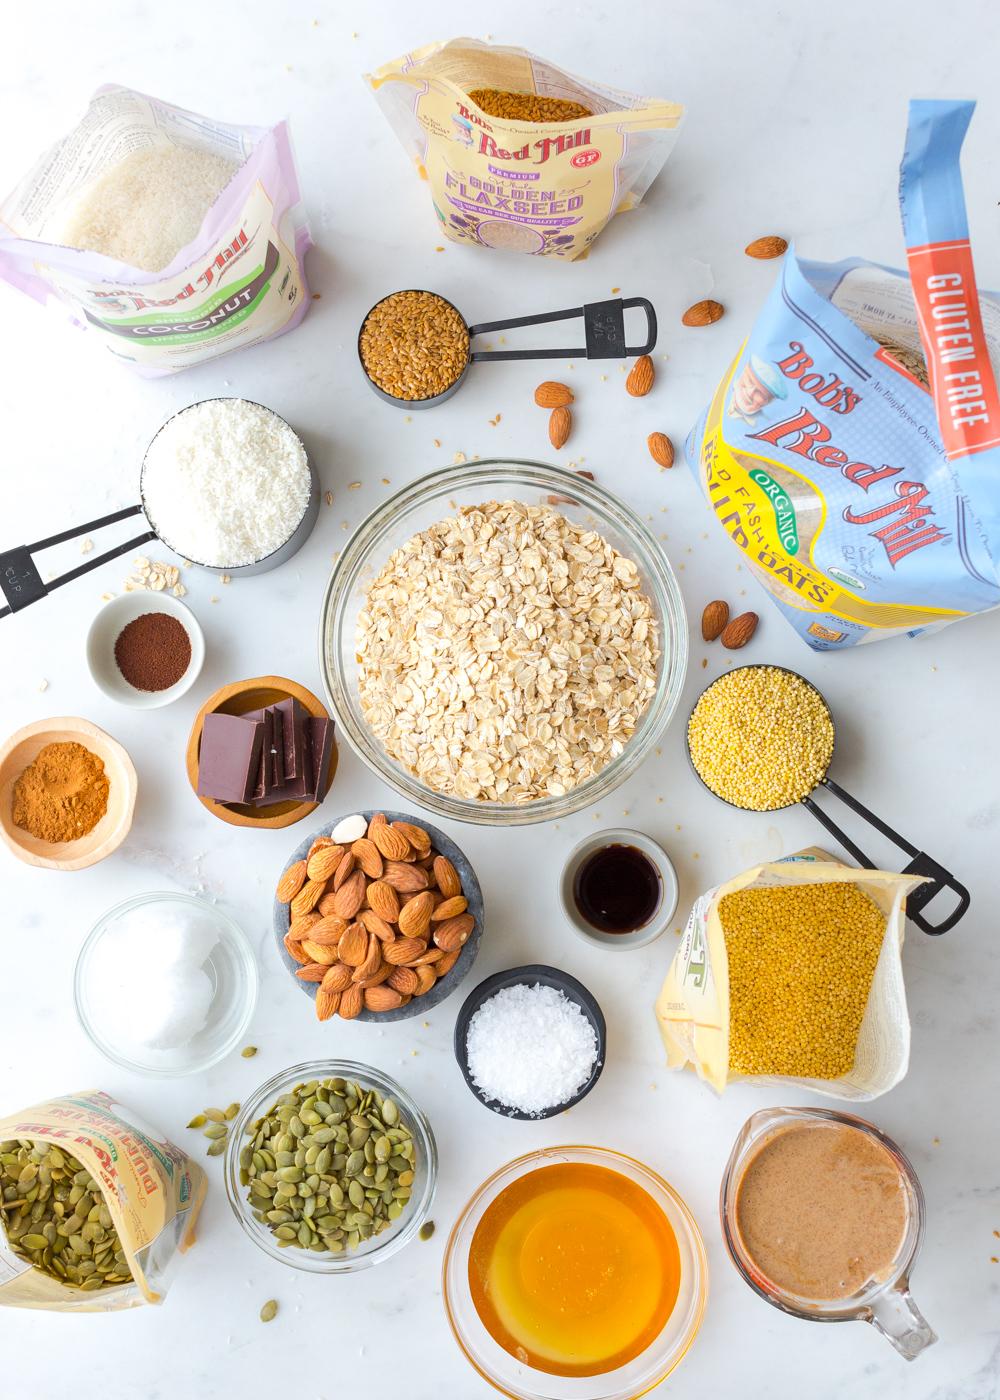 Ingredients for Seedy Almond Oat Bars